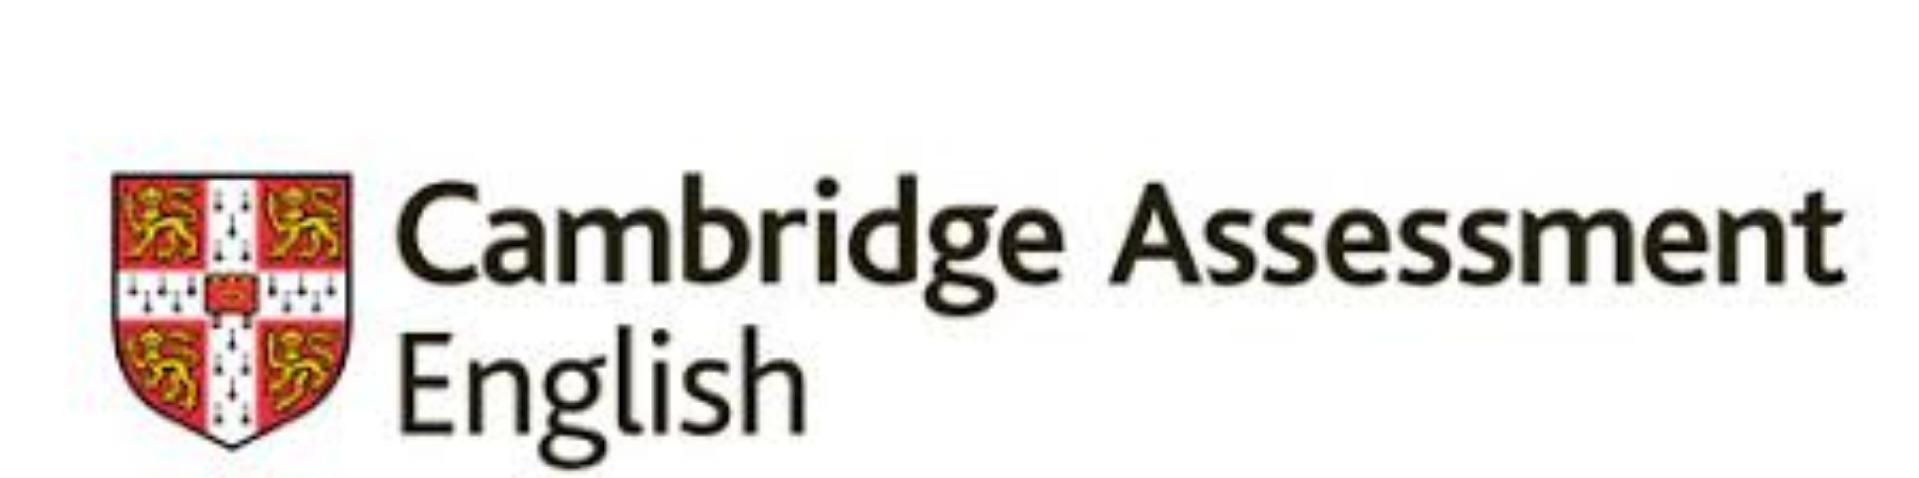 CAMBRIDGE ASSESSMENT ENGLISH - CERTIFICAZIONE L...